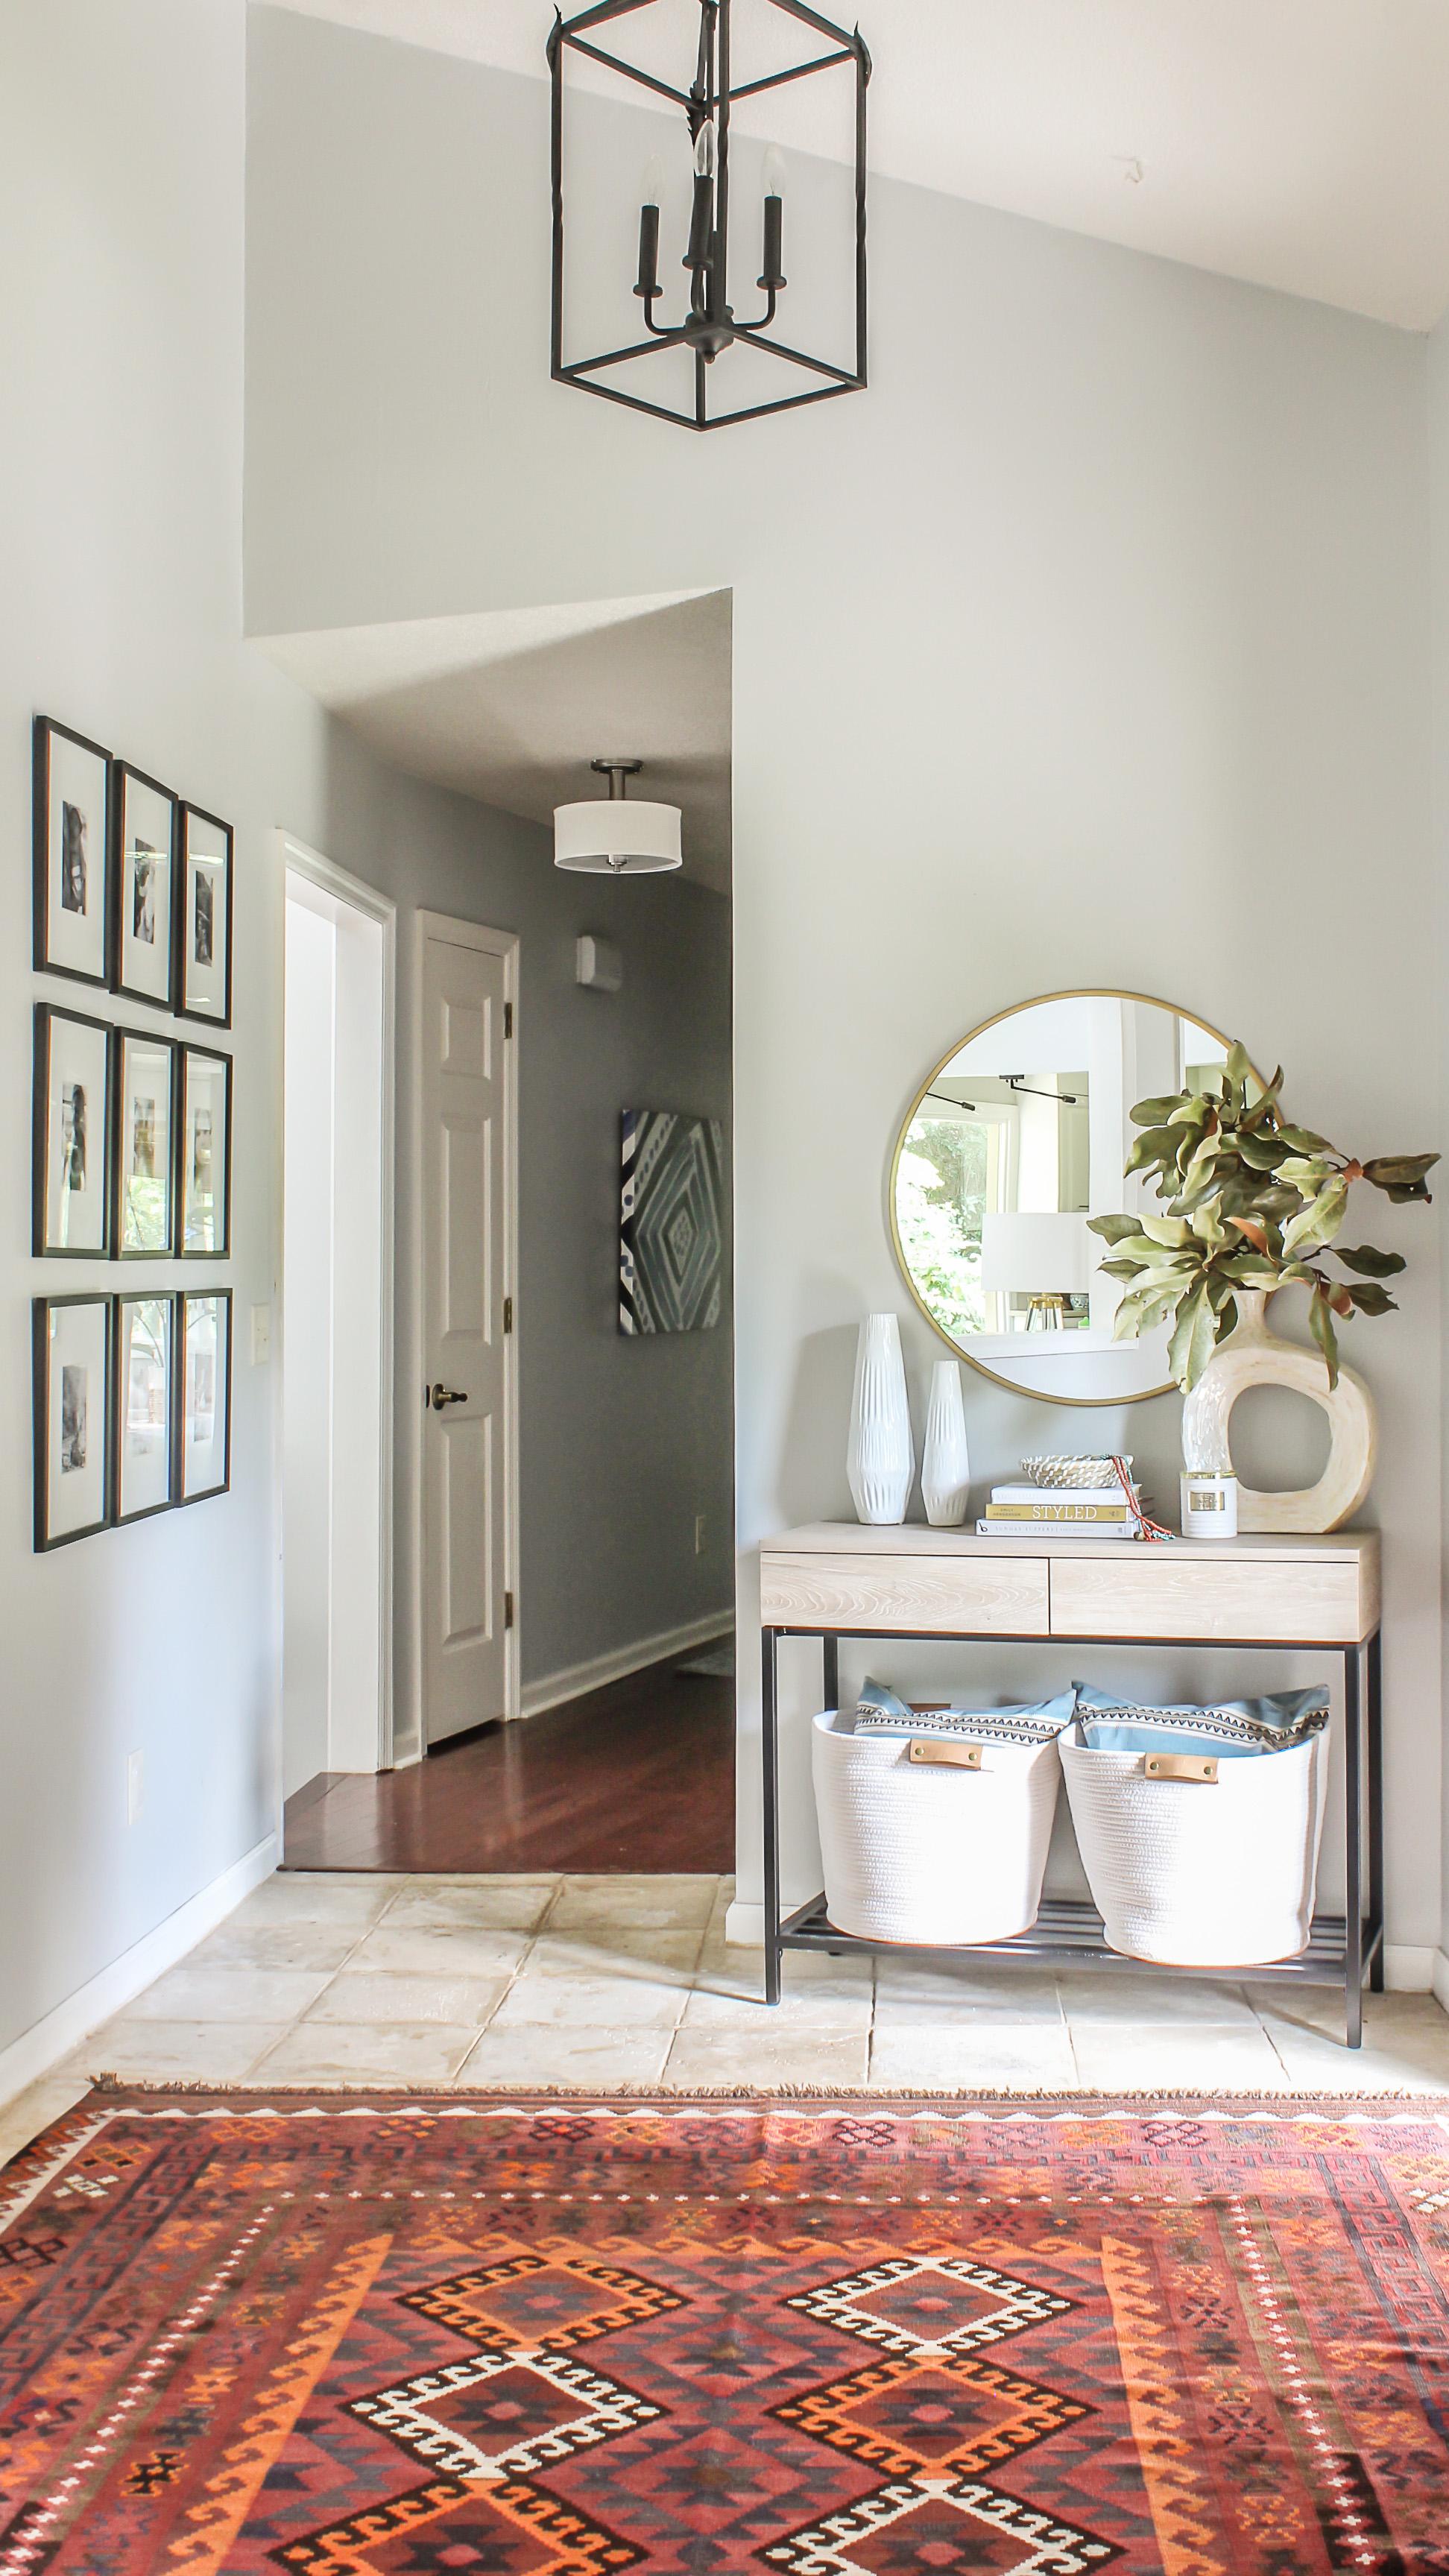 No Foyer Ideas : Modern farmhouse meets boho foyer makeover budget friendly decor